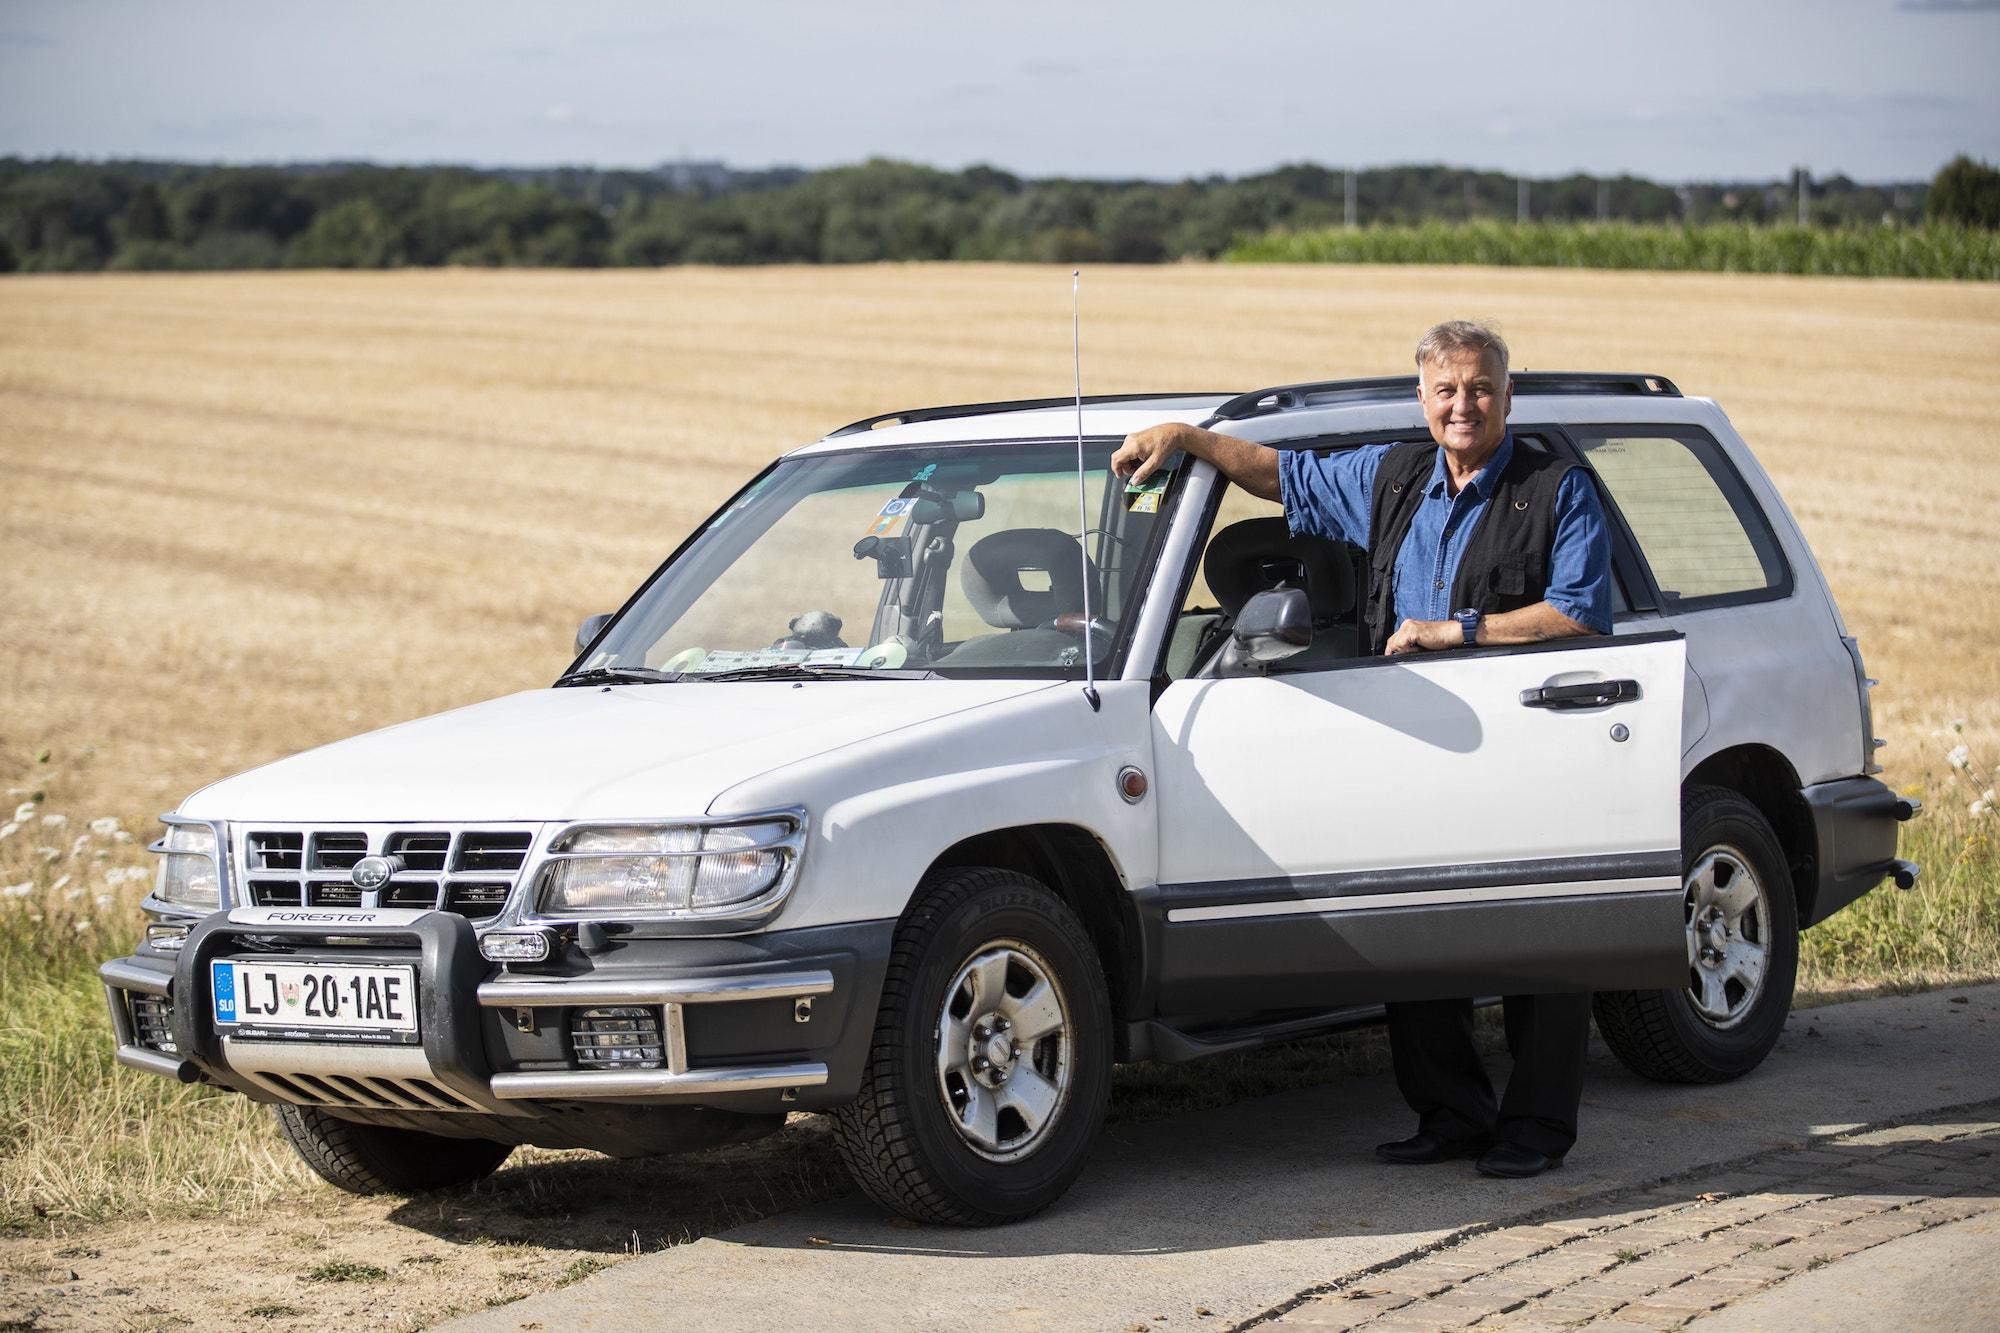 Subaru Forester hits one million kilometres